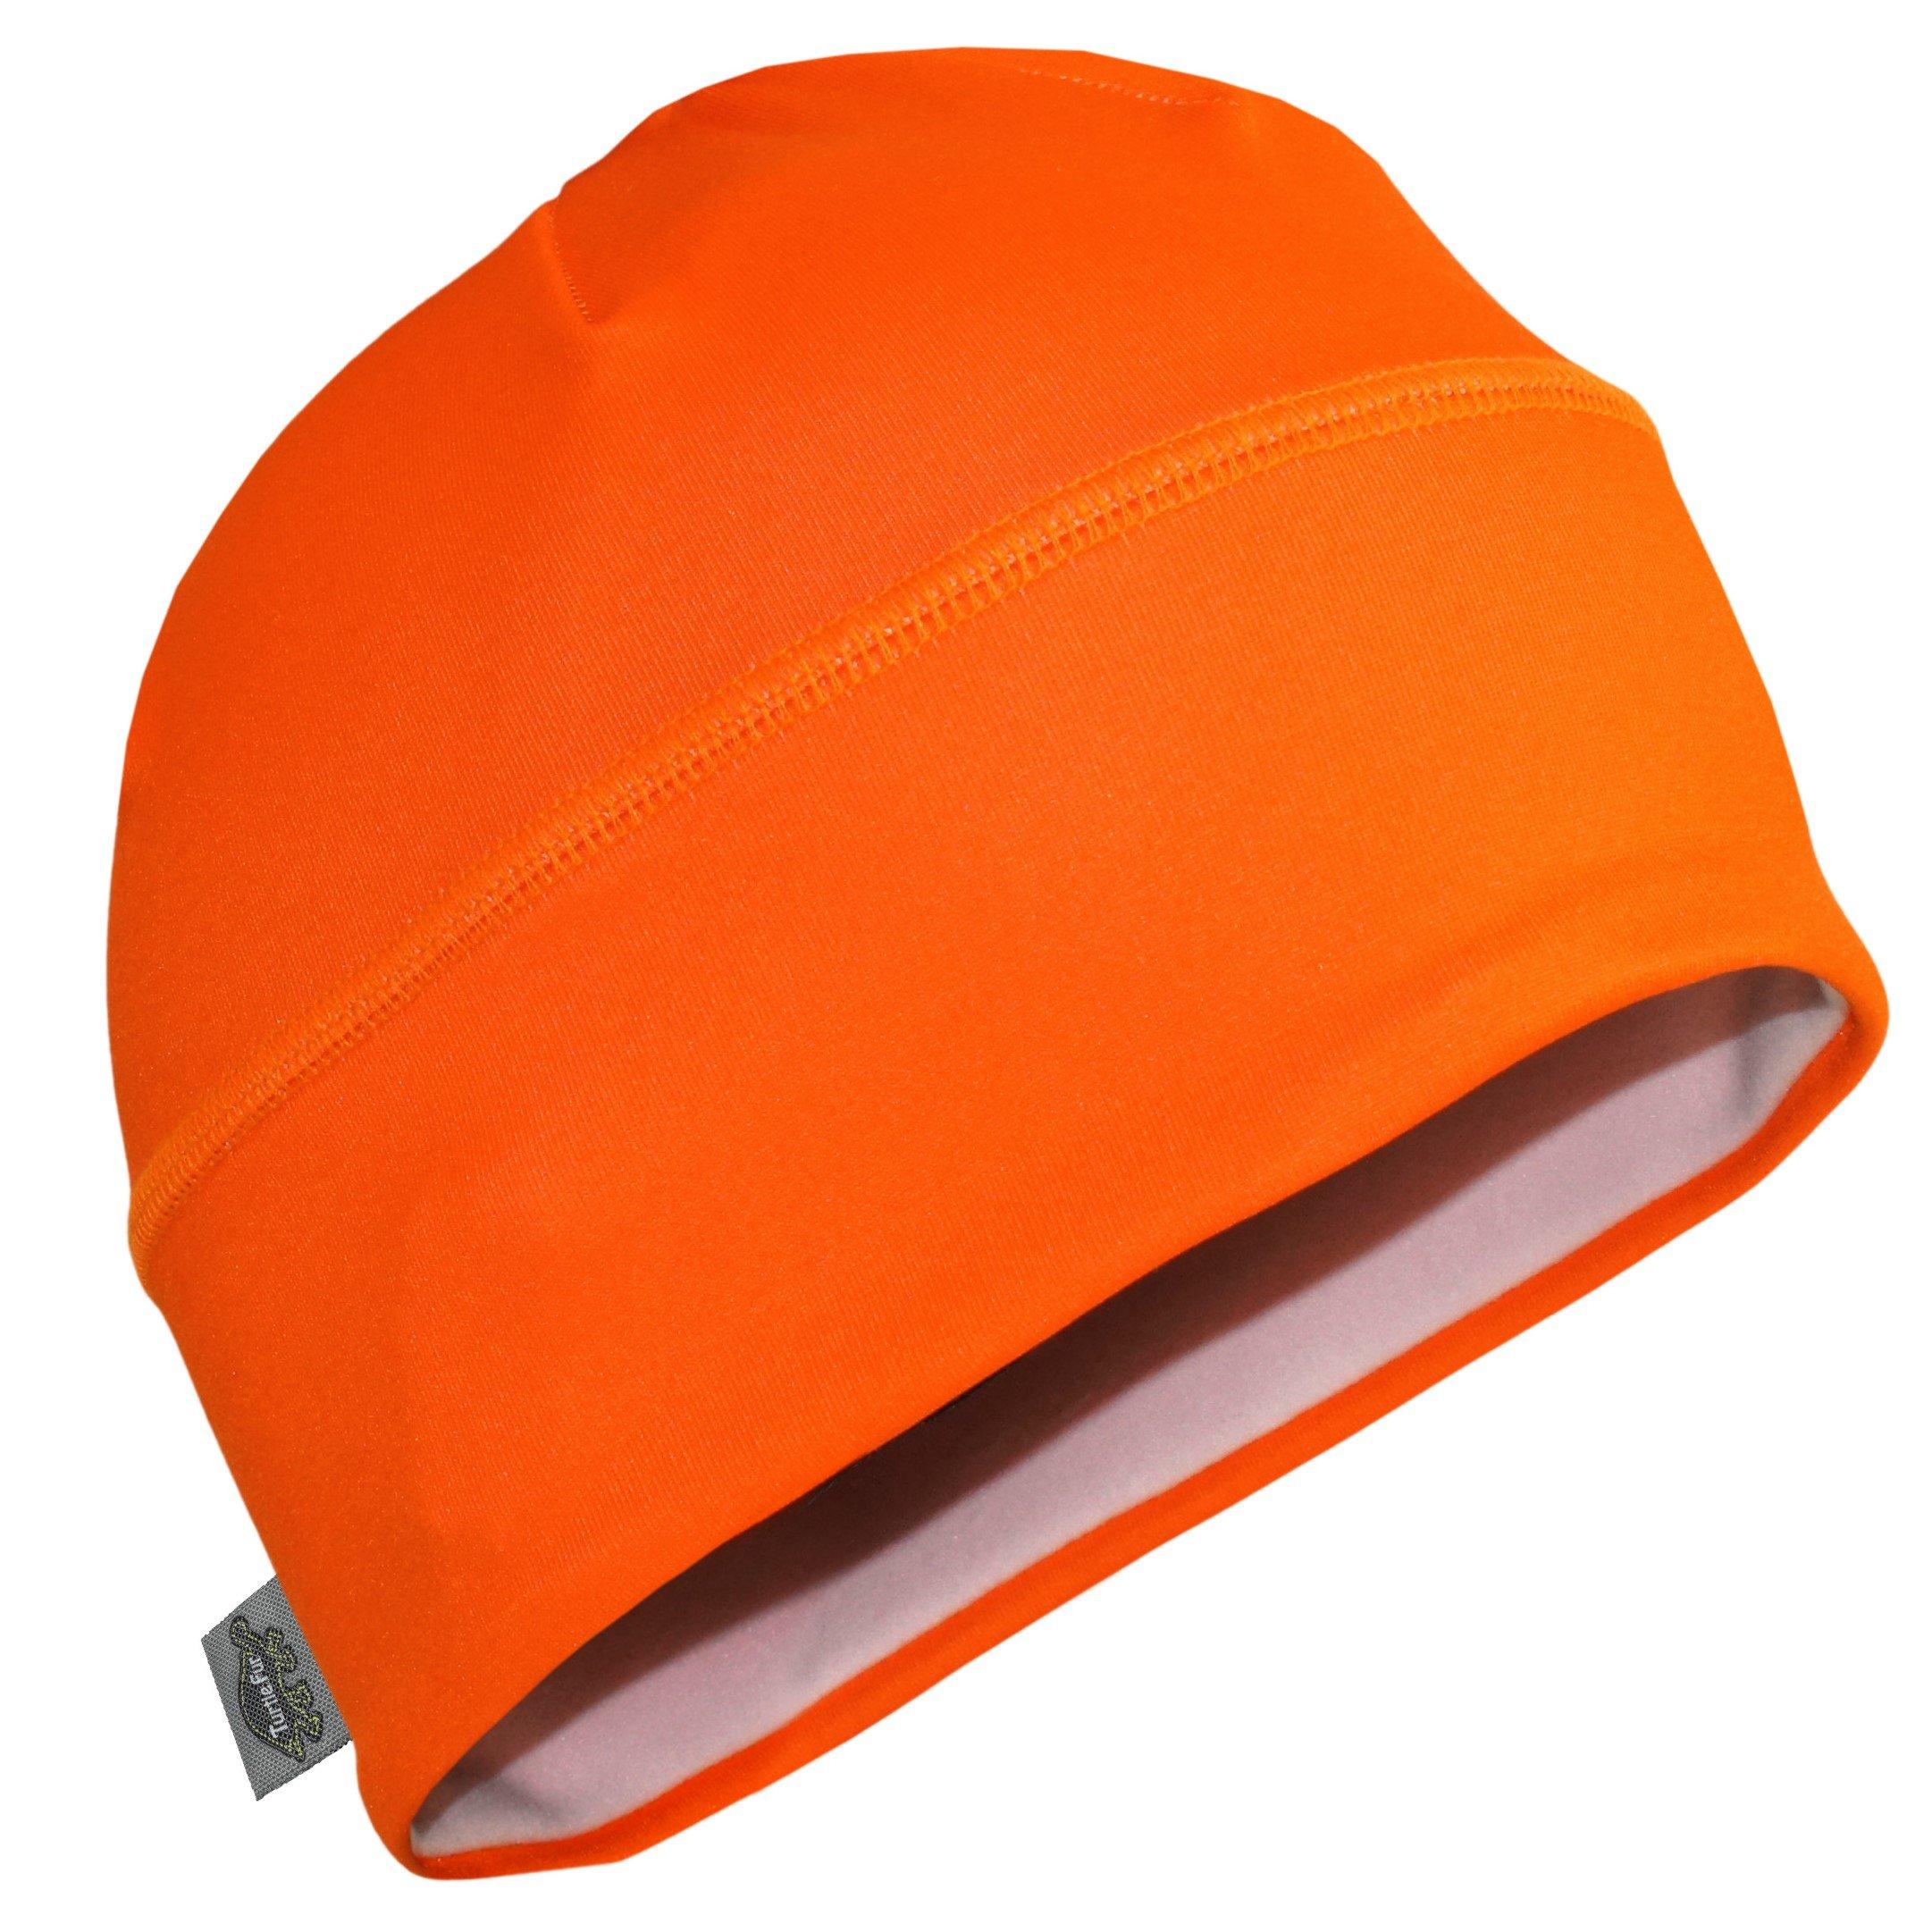 Turtle Fur Kids Comfort Shell Brain Shroud Lightweight Snug Beanie Helmet Liner Blaze